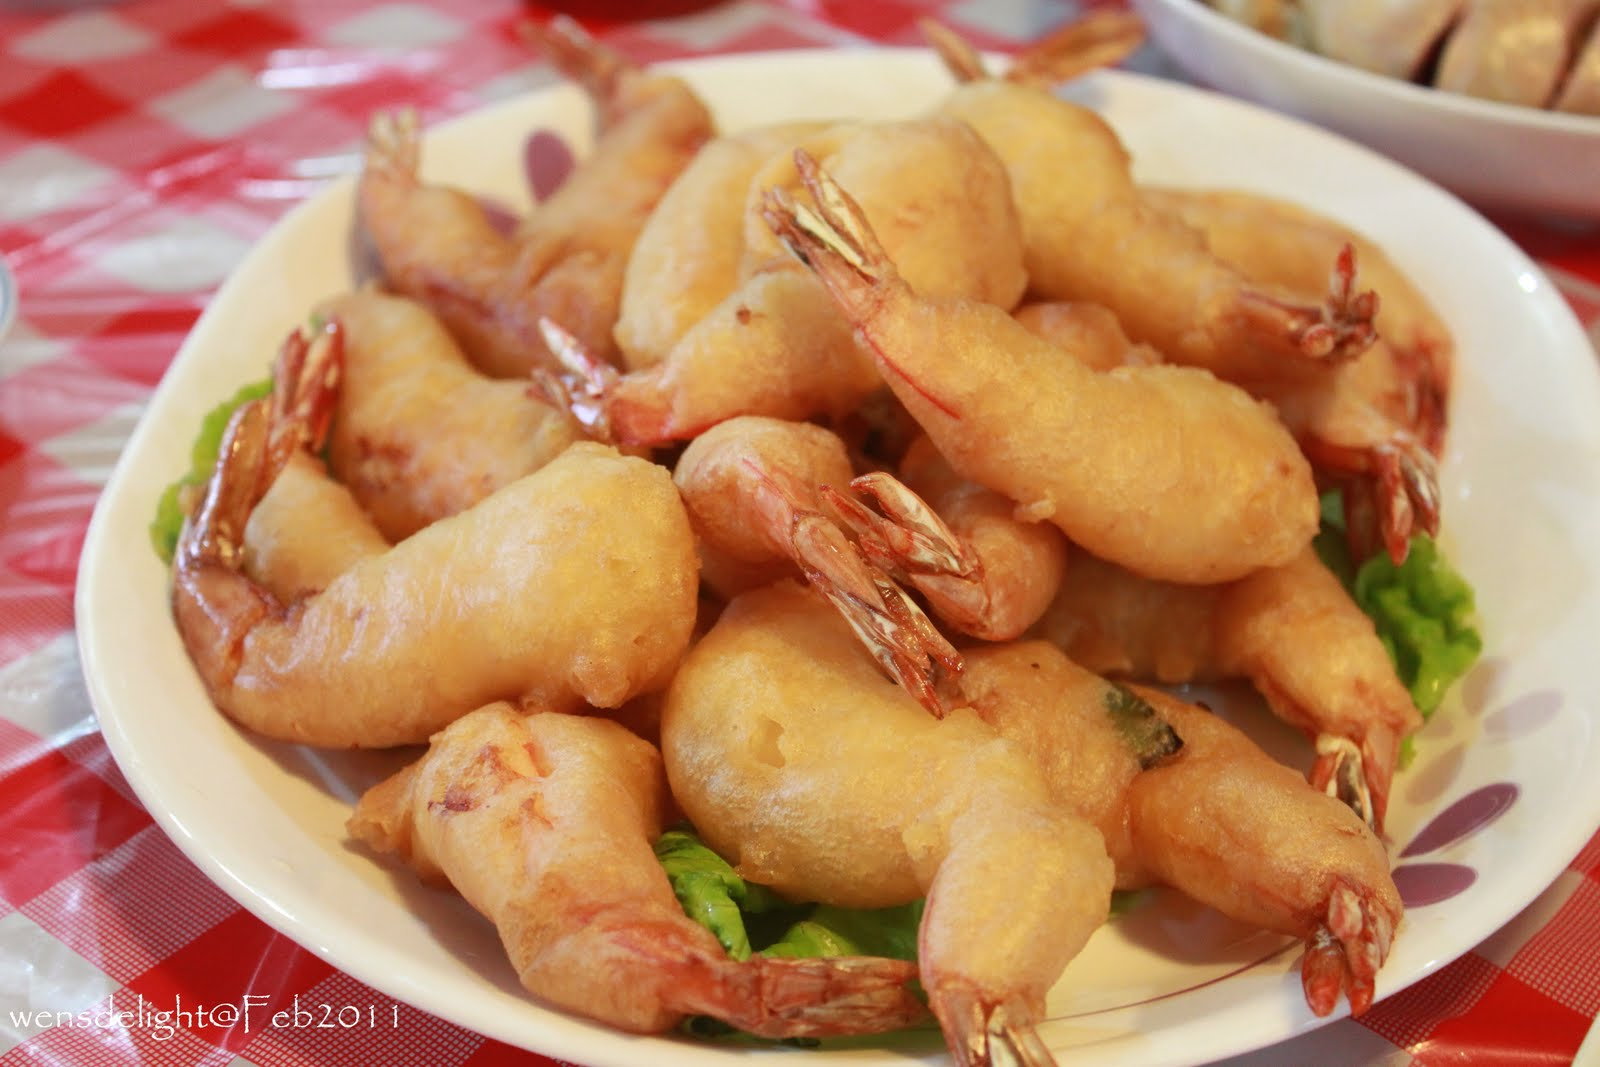 Wens delight crispy puffy prawns crispy puffy prawns forumfinder Images